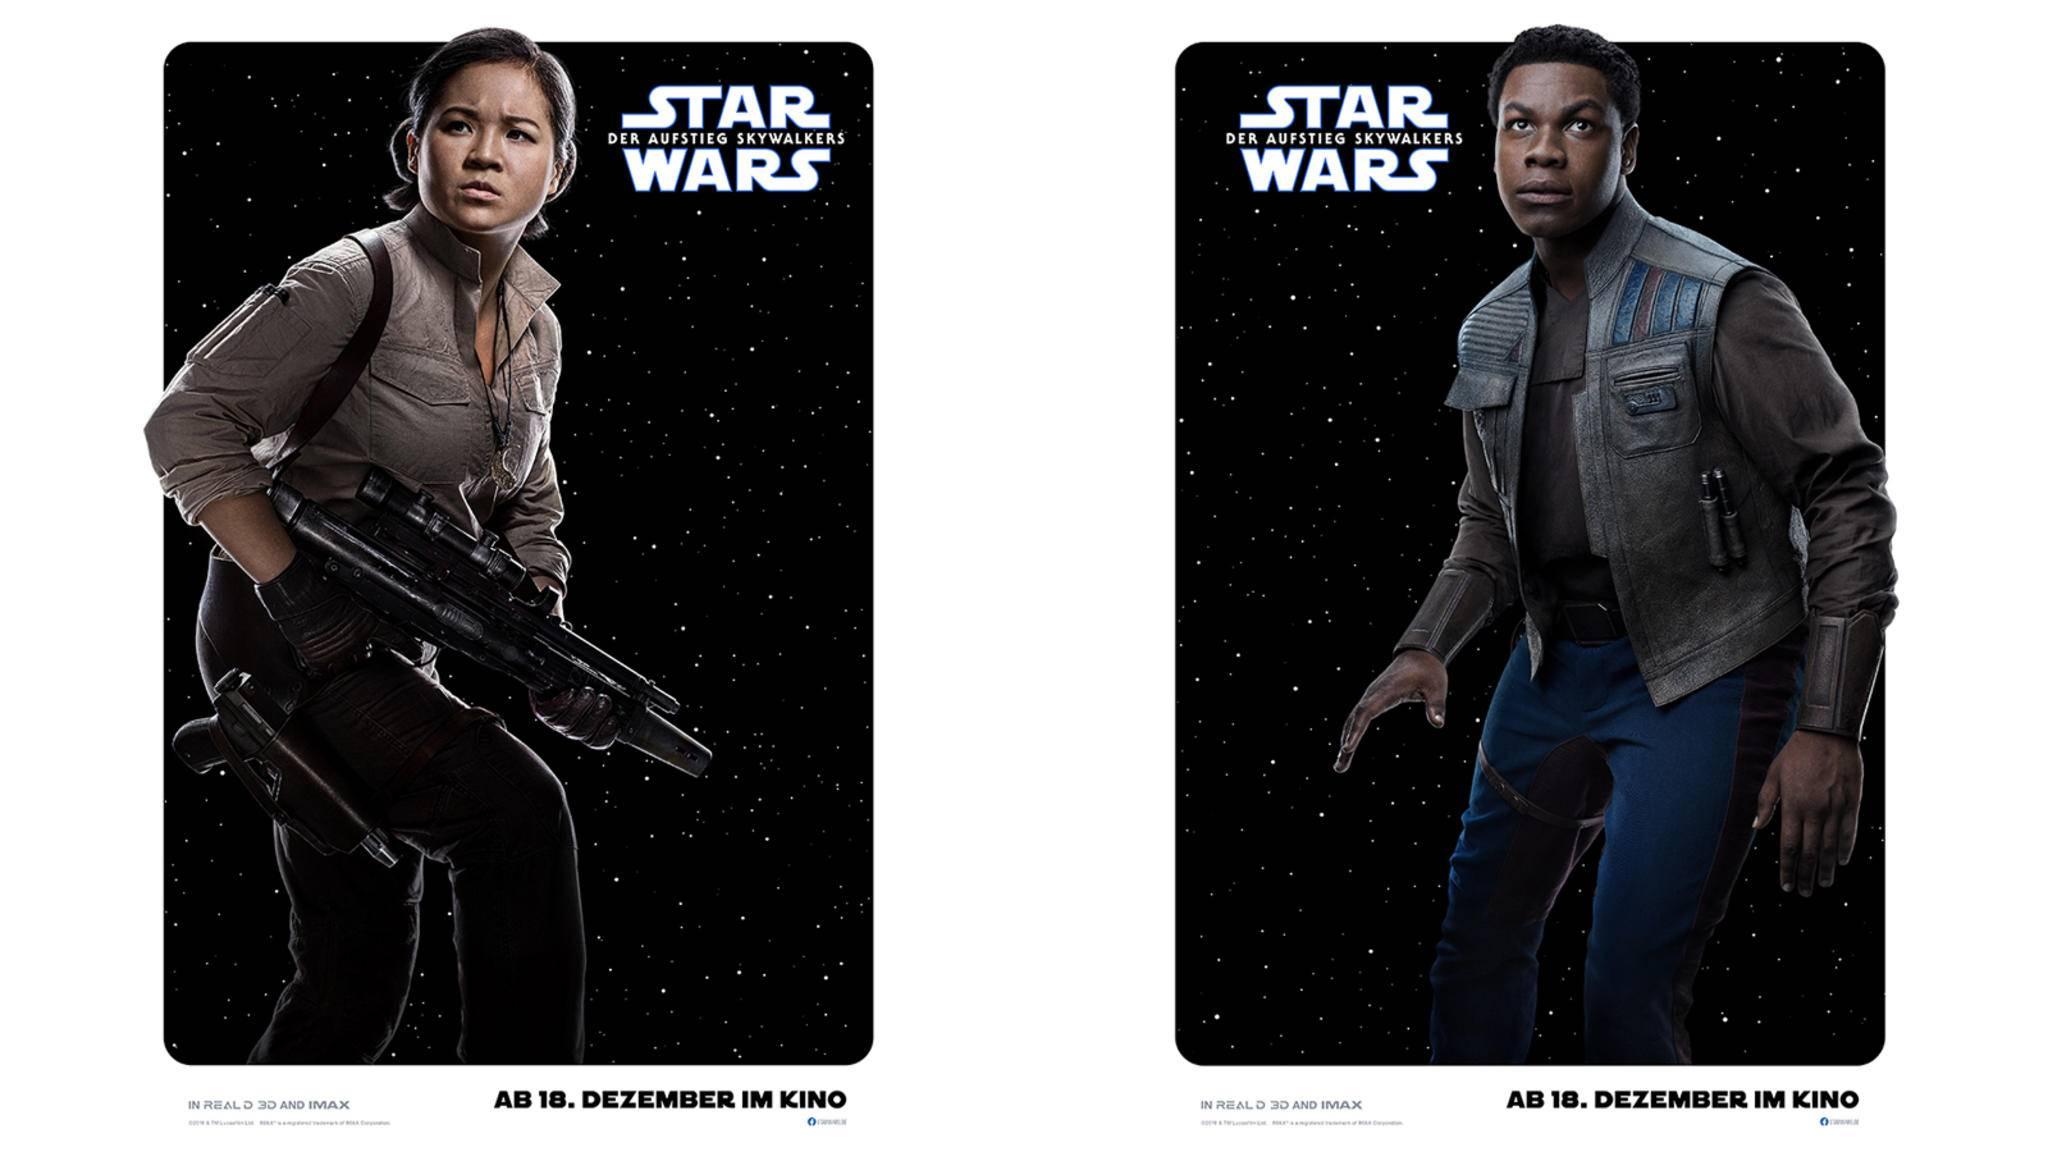 Star Wars Aufstieg Skywalkers Rose Finn